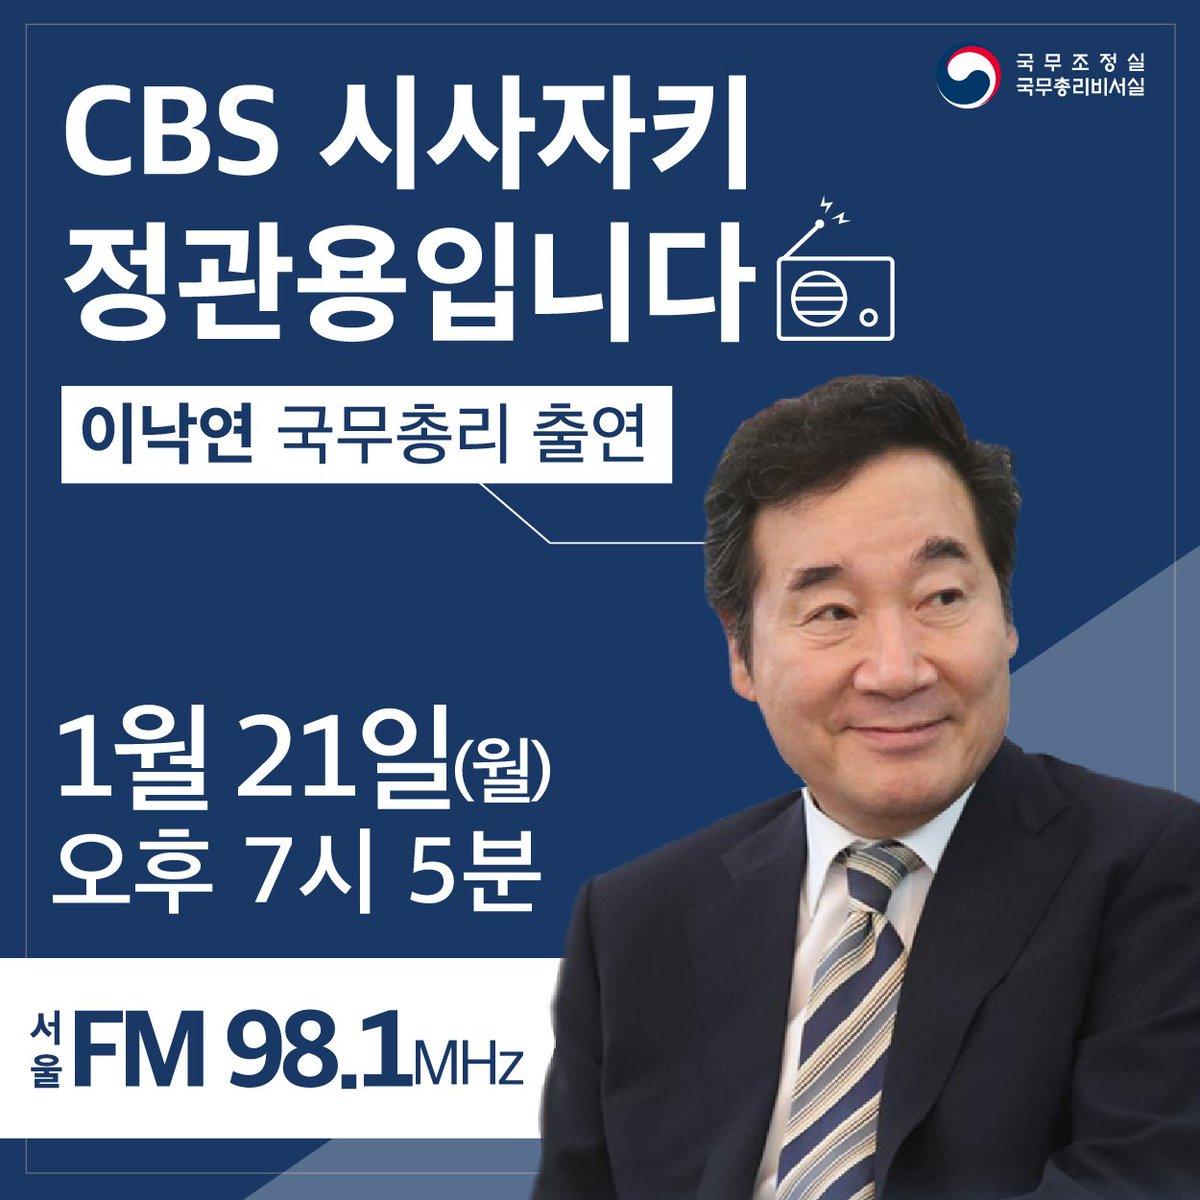 ‼️오늘(1.21) 오후 7시 5분‼️ CBS 라디오 '시사자키 정관용입니다'에 #이낙연 총리가 출연합니다!  많은 청취부탁드려요~👀👂🏻  * FM 98.1MHz-서울 🔎 지역별 주파수 보기 : https://t.co/uefmgWD0OR